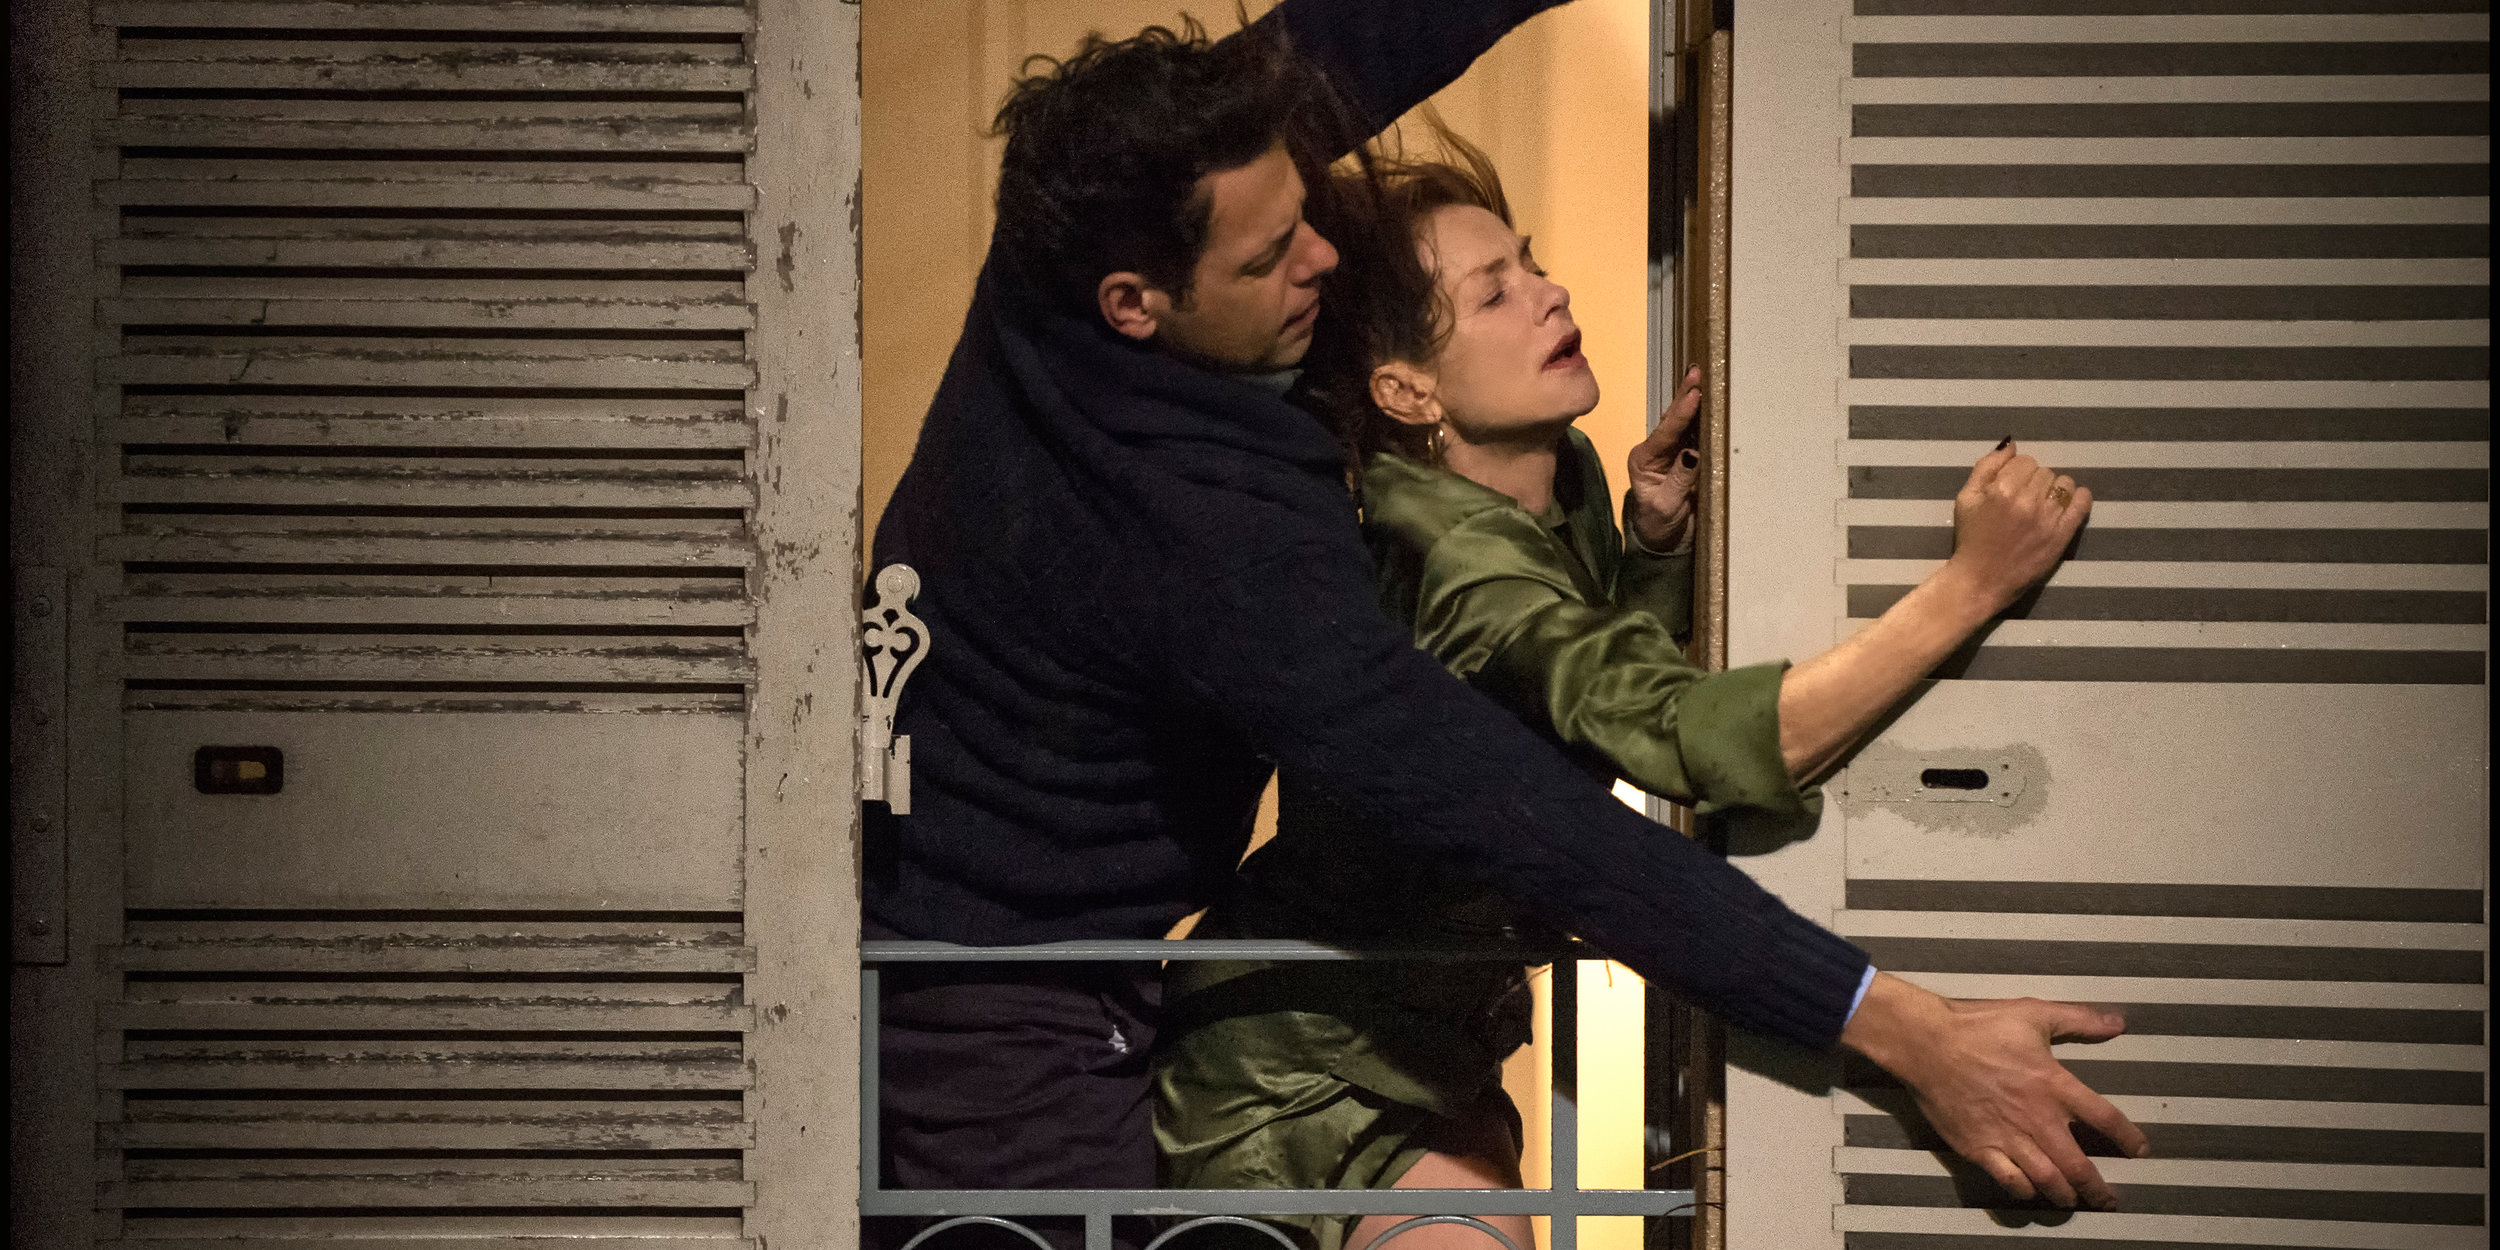 fryd skuespiller dating dating en empath mann